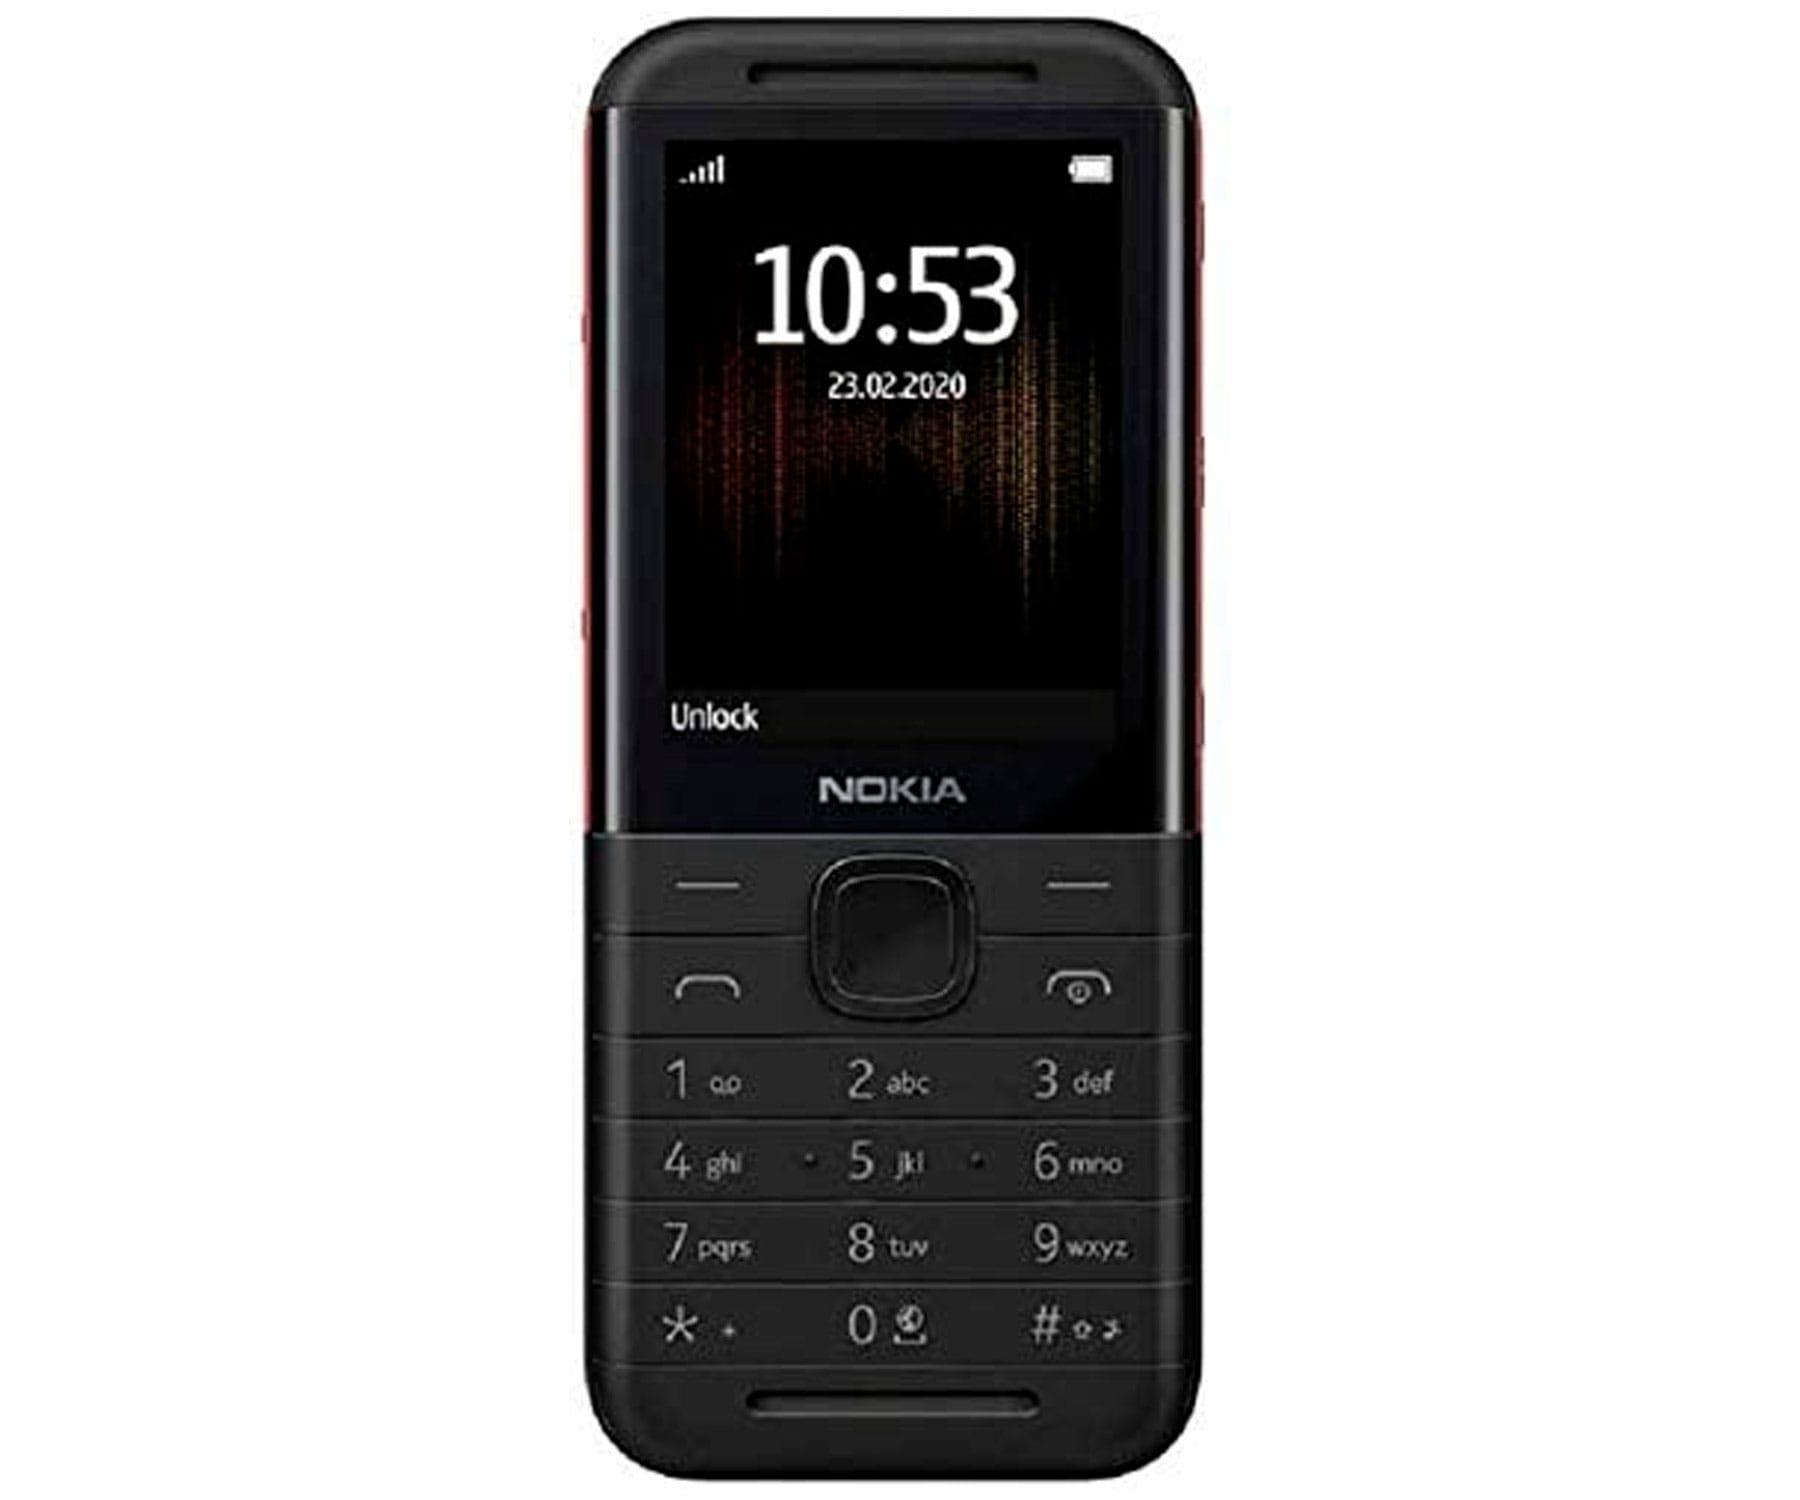 NOKIA 5310 NEGRO/ROJO MÓVIL GSM DUAL SIM 2.4'' QVGA 16MB HASTA 32GB CON SD CÁMARA VGA CON FLASH BLUETOOTH 3.0 FM